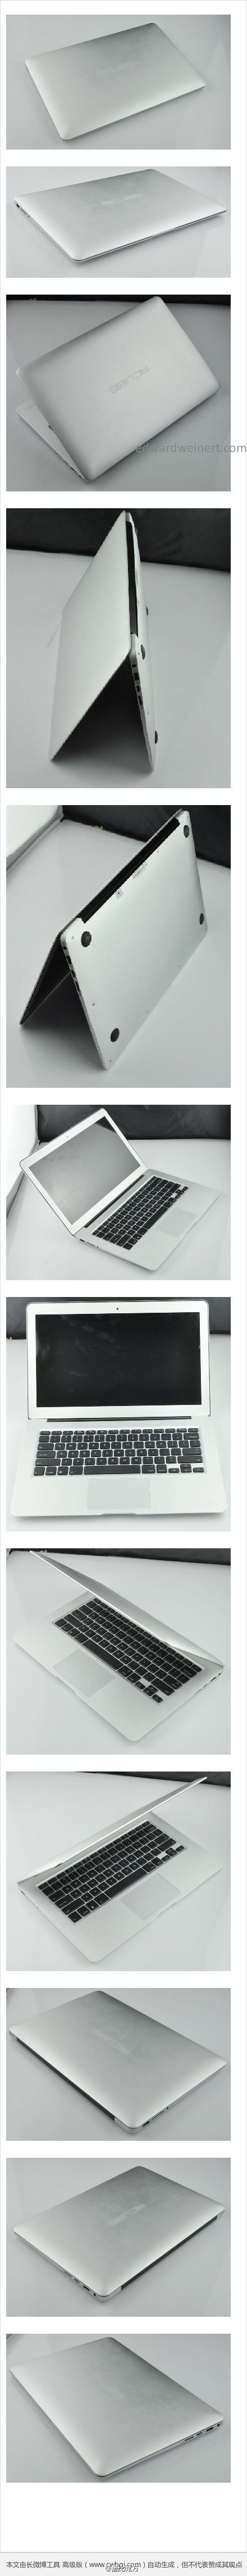 cube-netbook